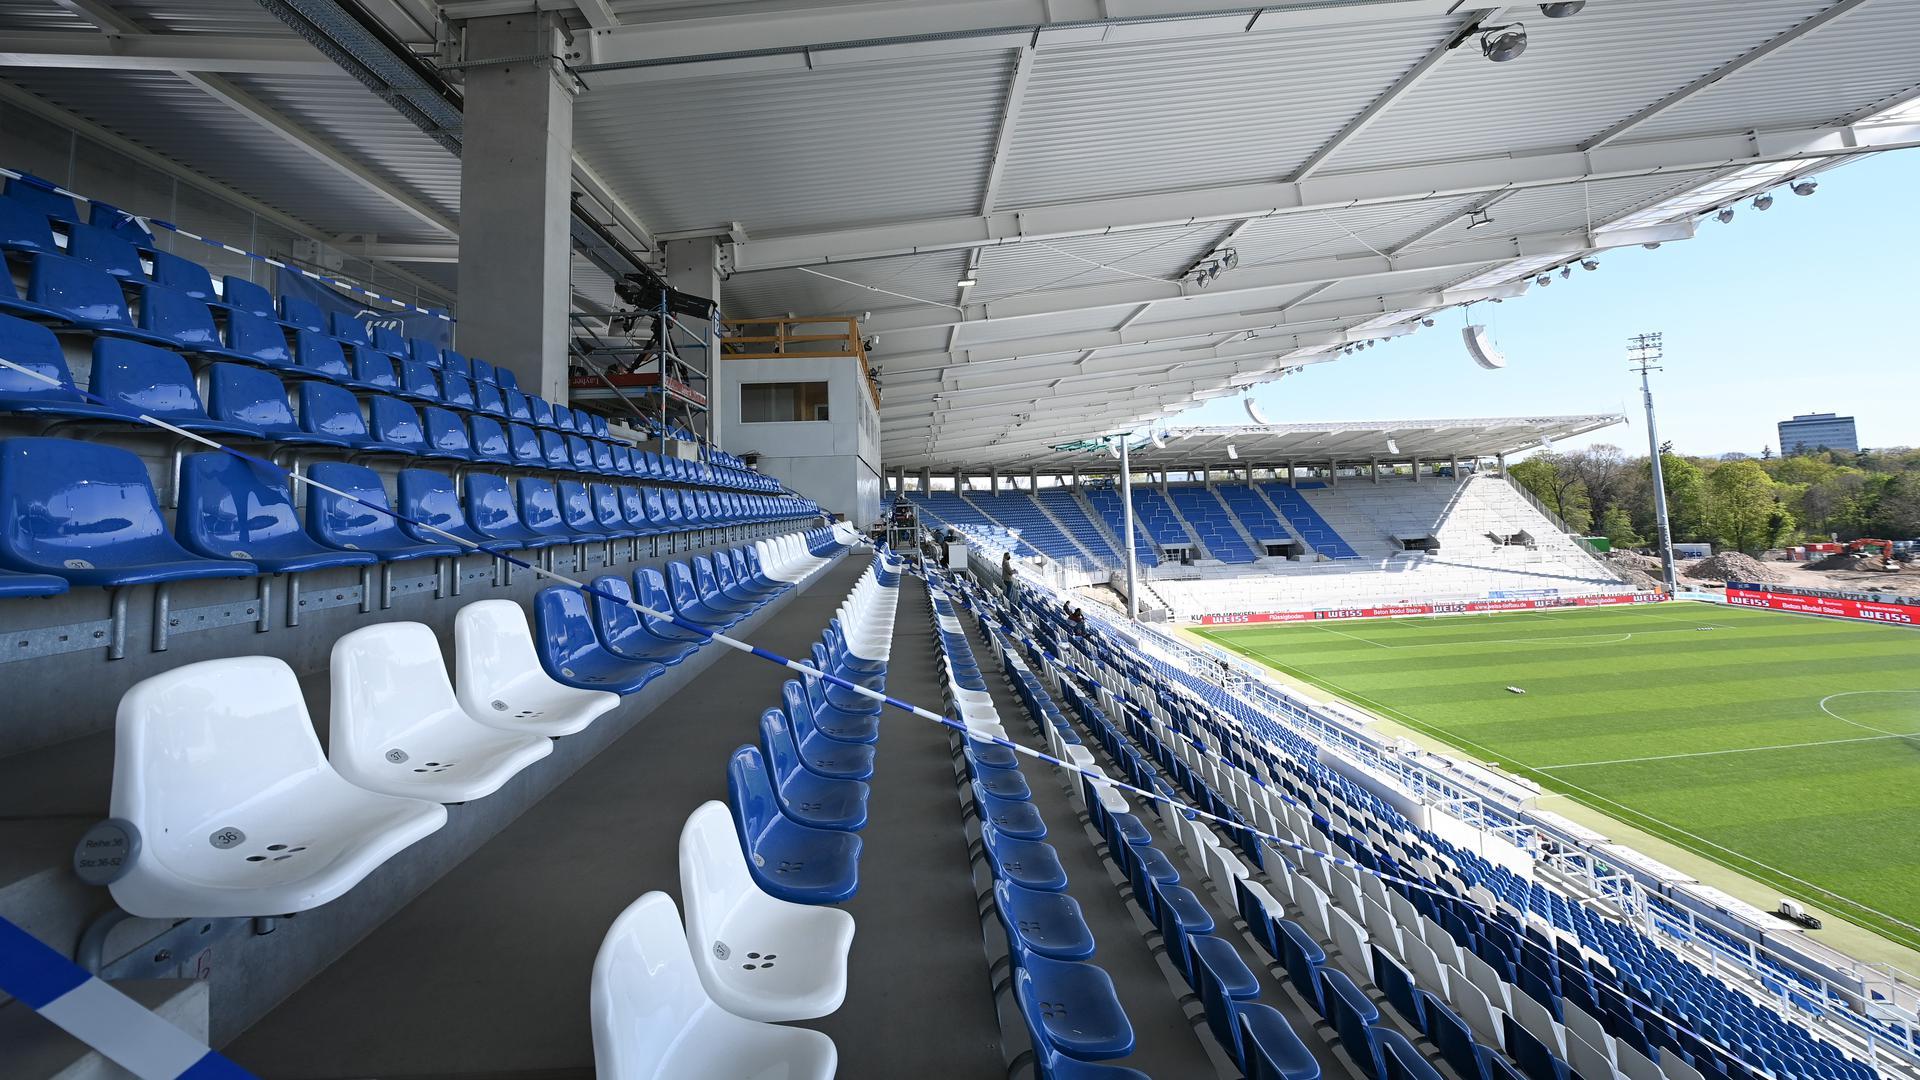 Stadionuebersicht Wildparkstadion Karlsruhe  GES/ Fussball/ 2. Bundesliga: Karlsruher SC - Erzgebirge Aue, 26.04.2021  Football / Soccer: 2nd League: Karlsruher SC vs Erzgebirge Aue, Karlsruhe, April 26, 2021